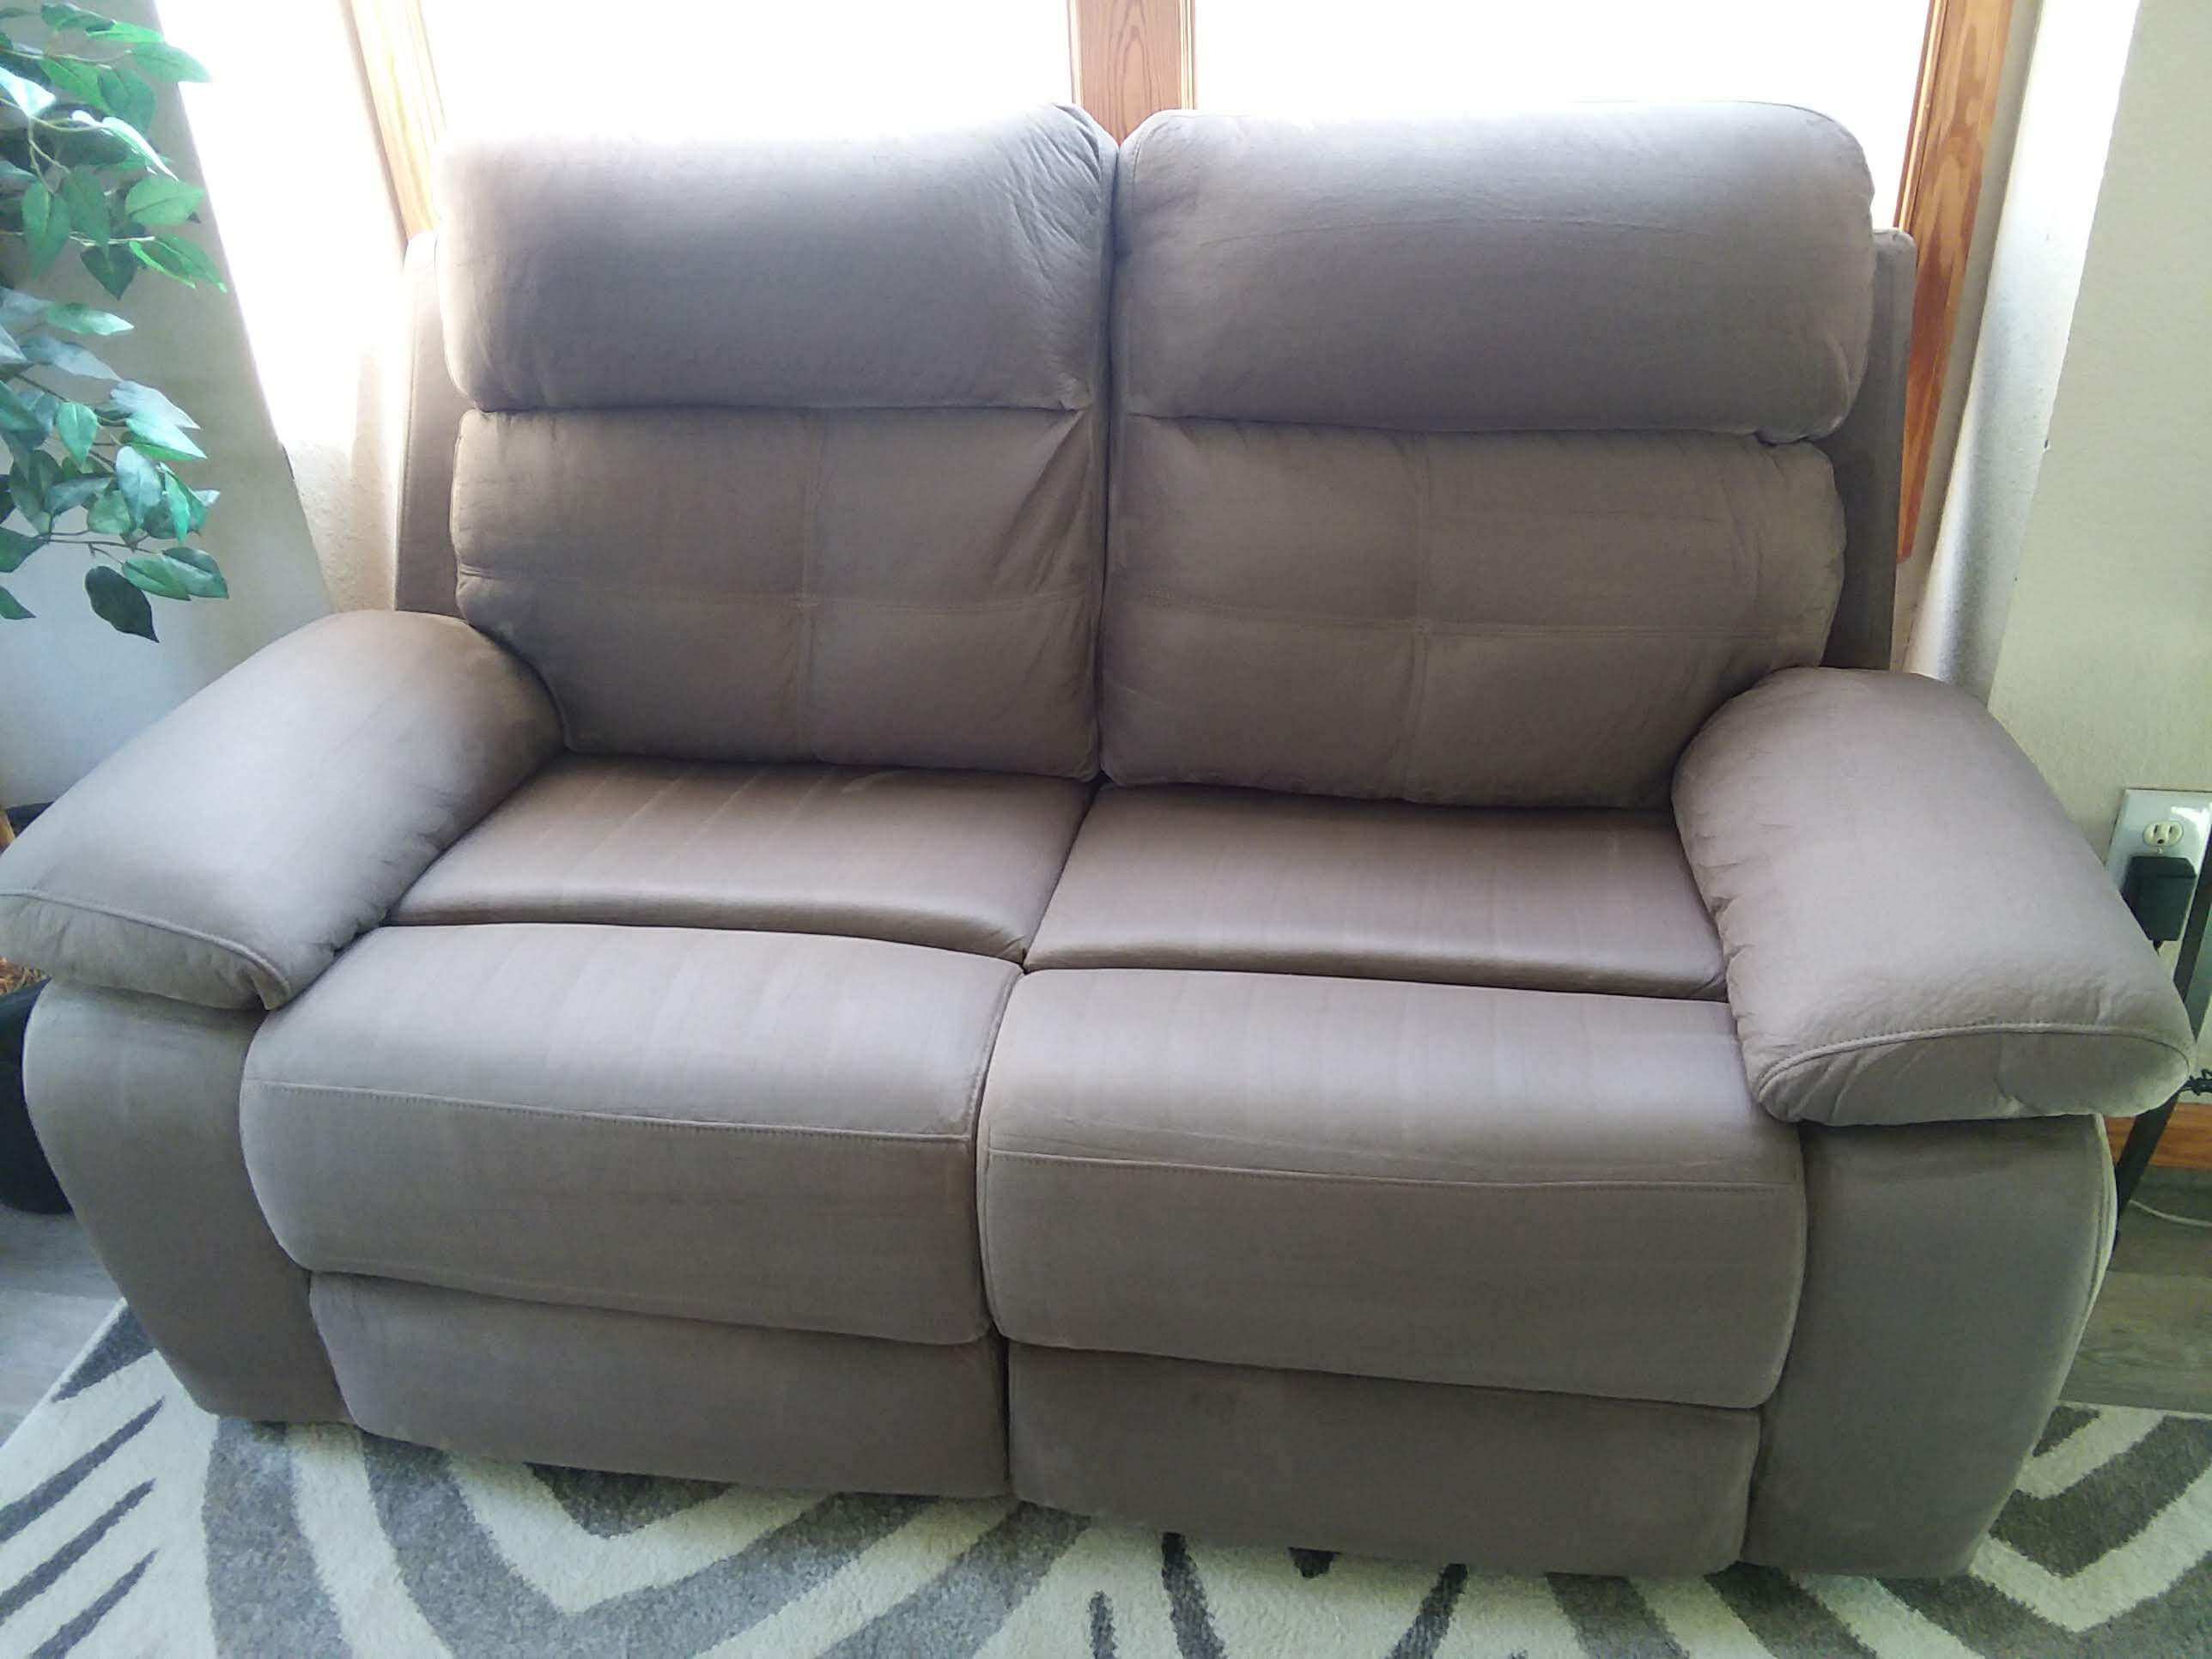 Carolina Pro Clean upholstery 4